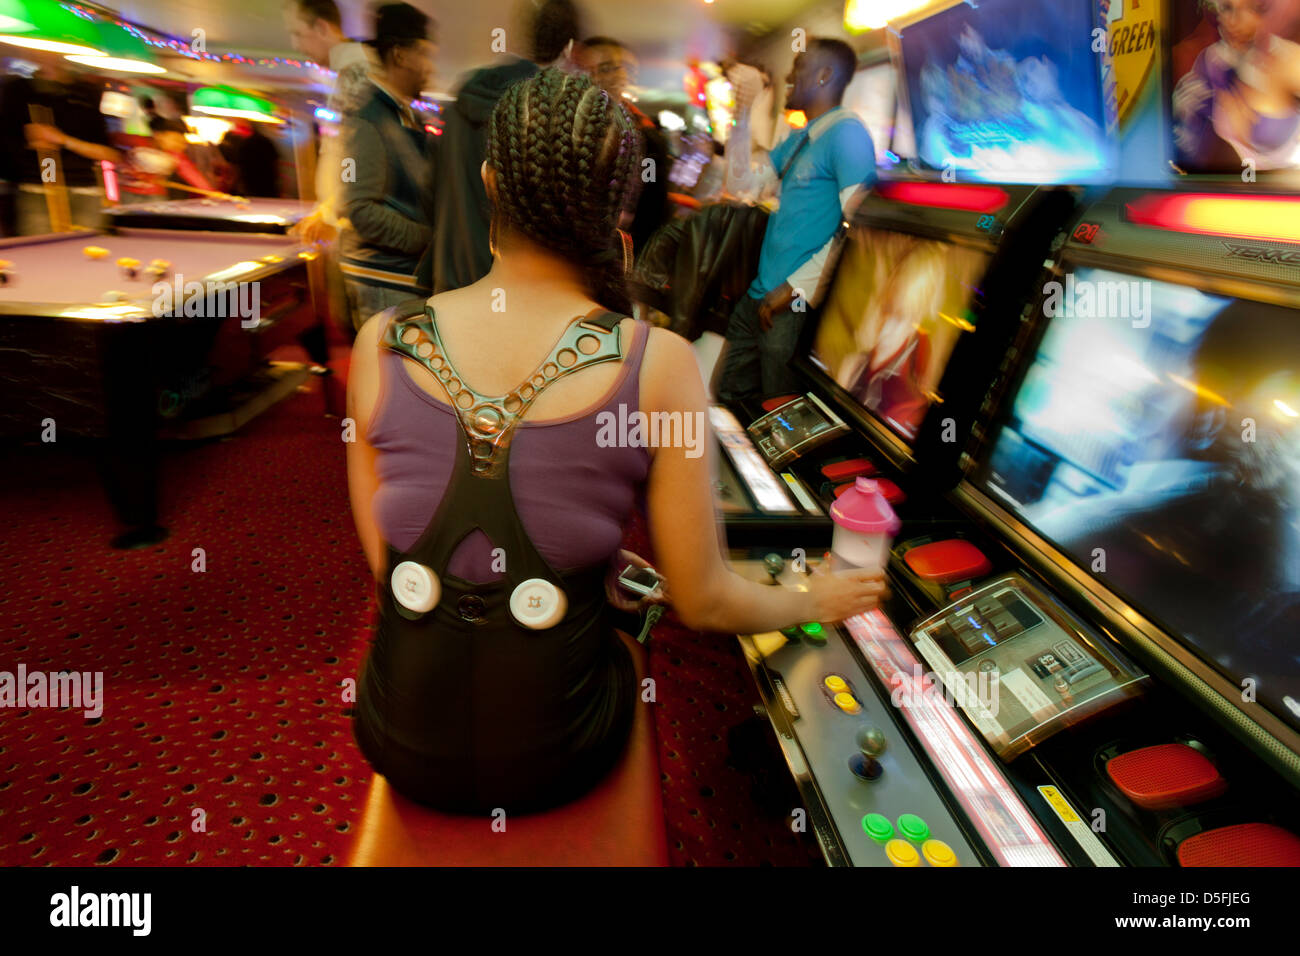 Arcade Party in Soho London - Stock Image